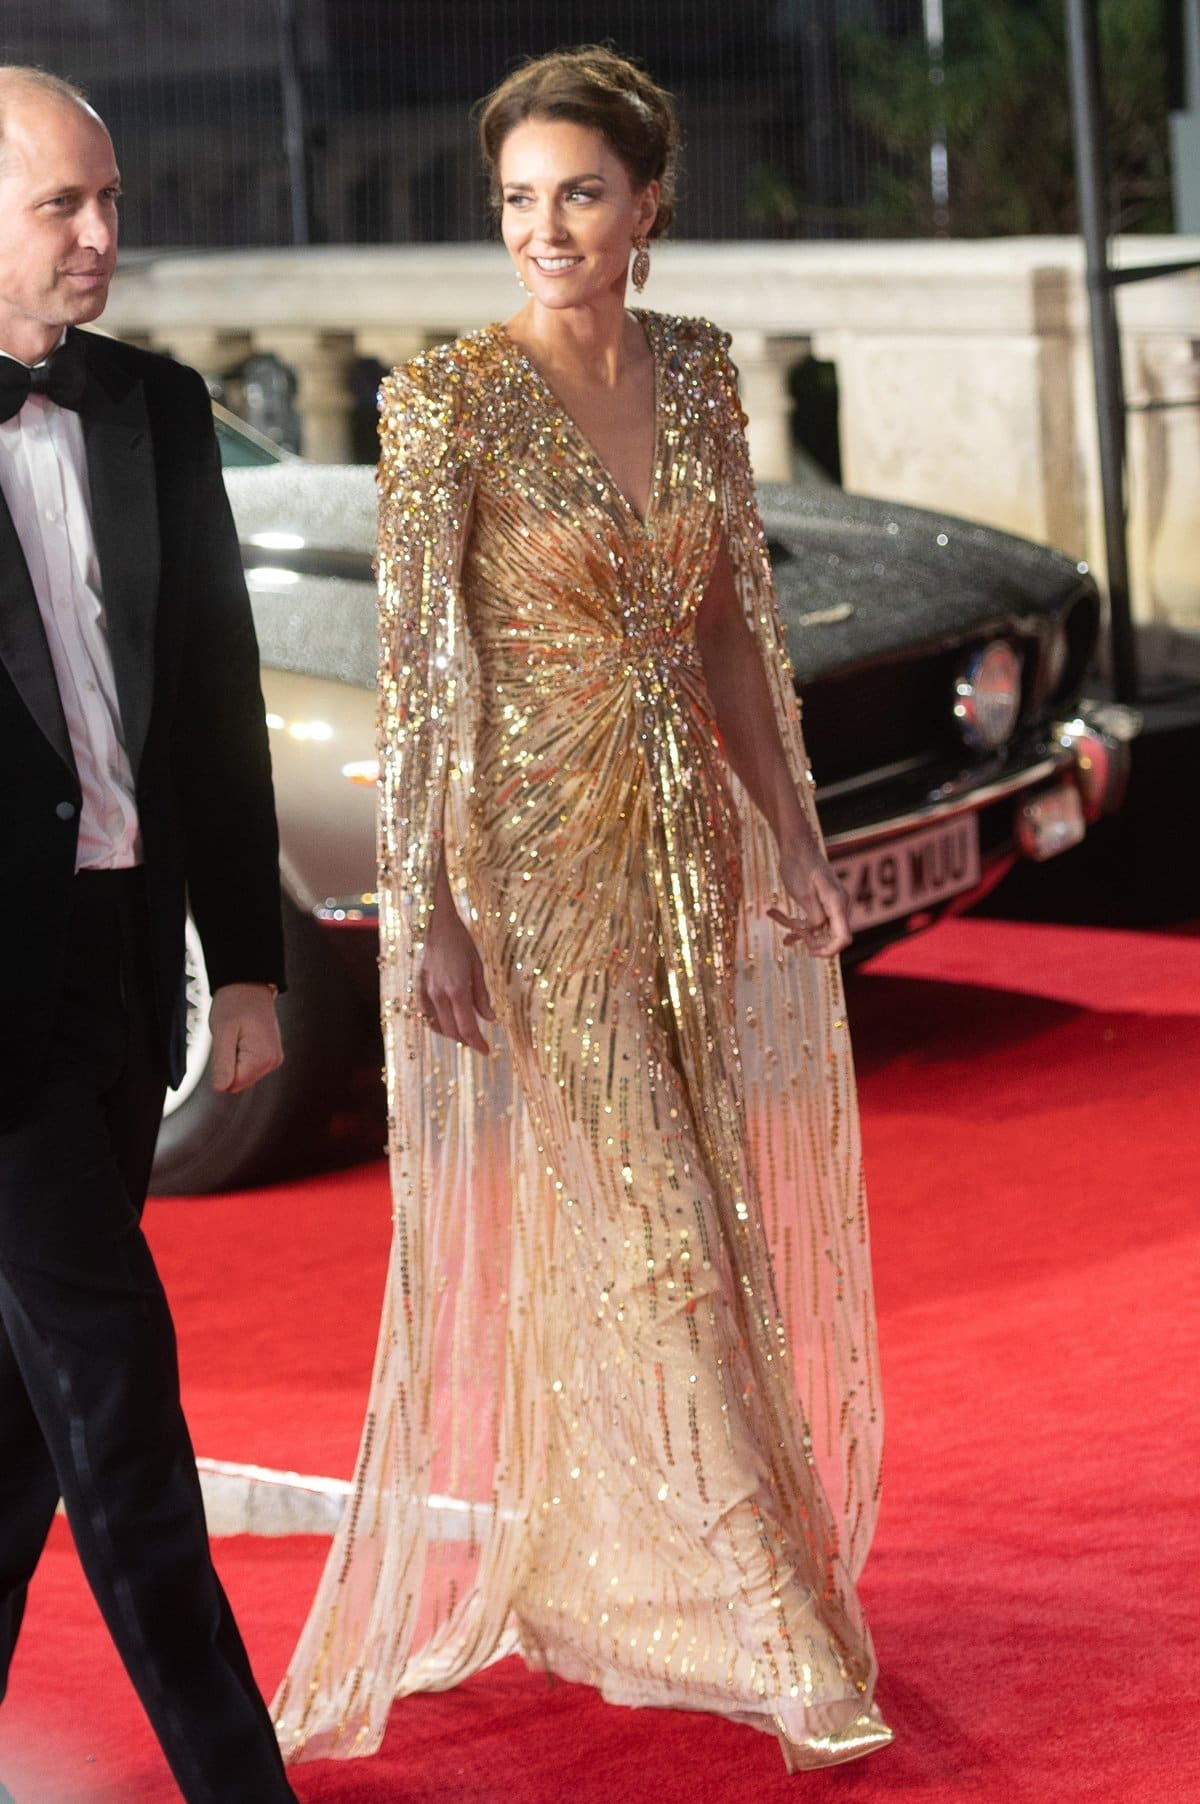 Kate Middleton arriving in gold Aquazzura Fenix 105mm pointed pumps